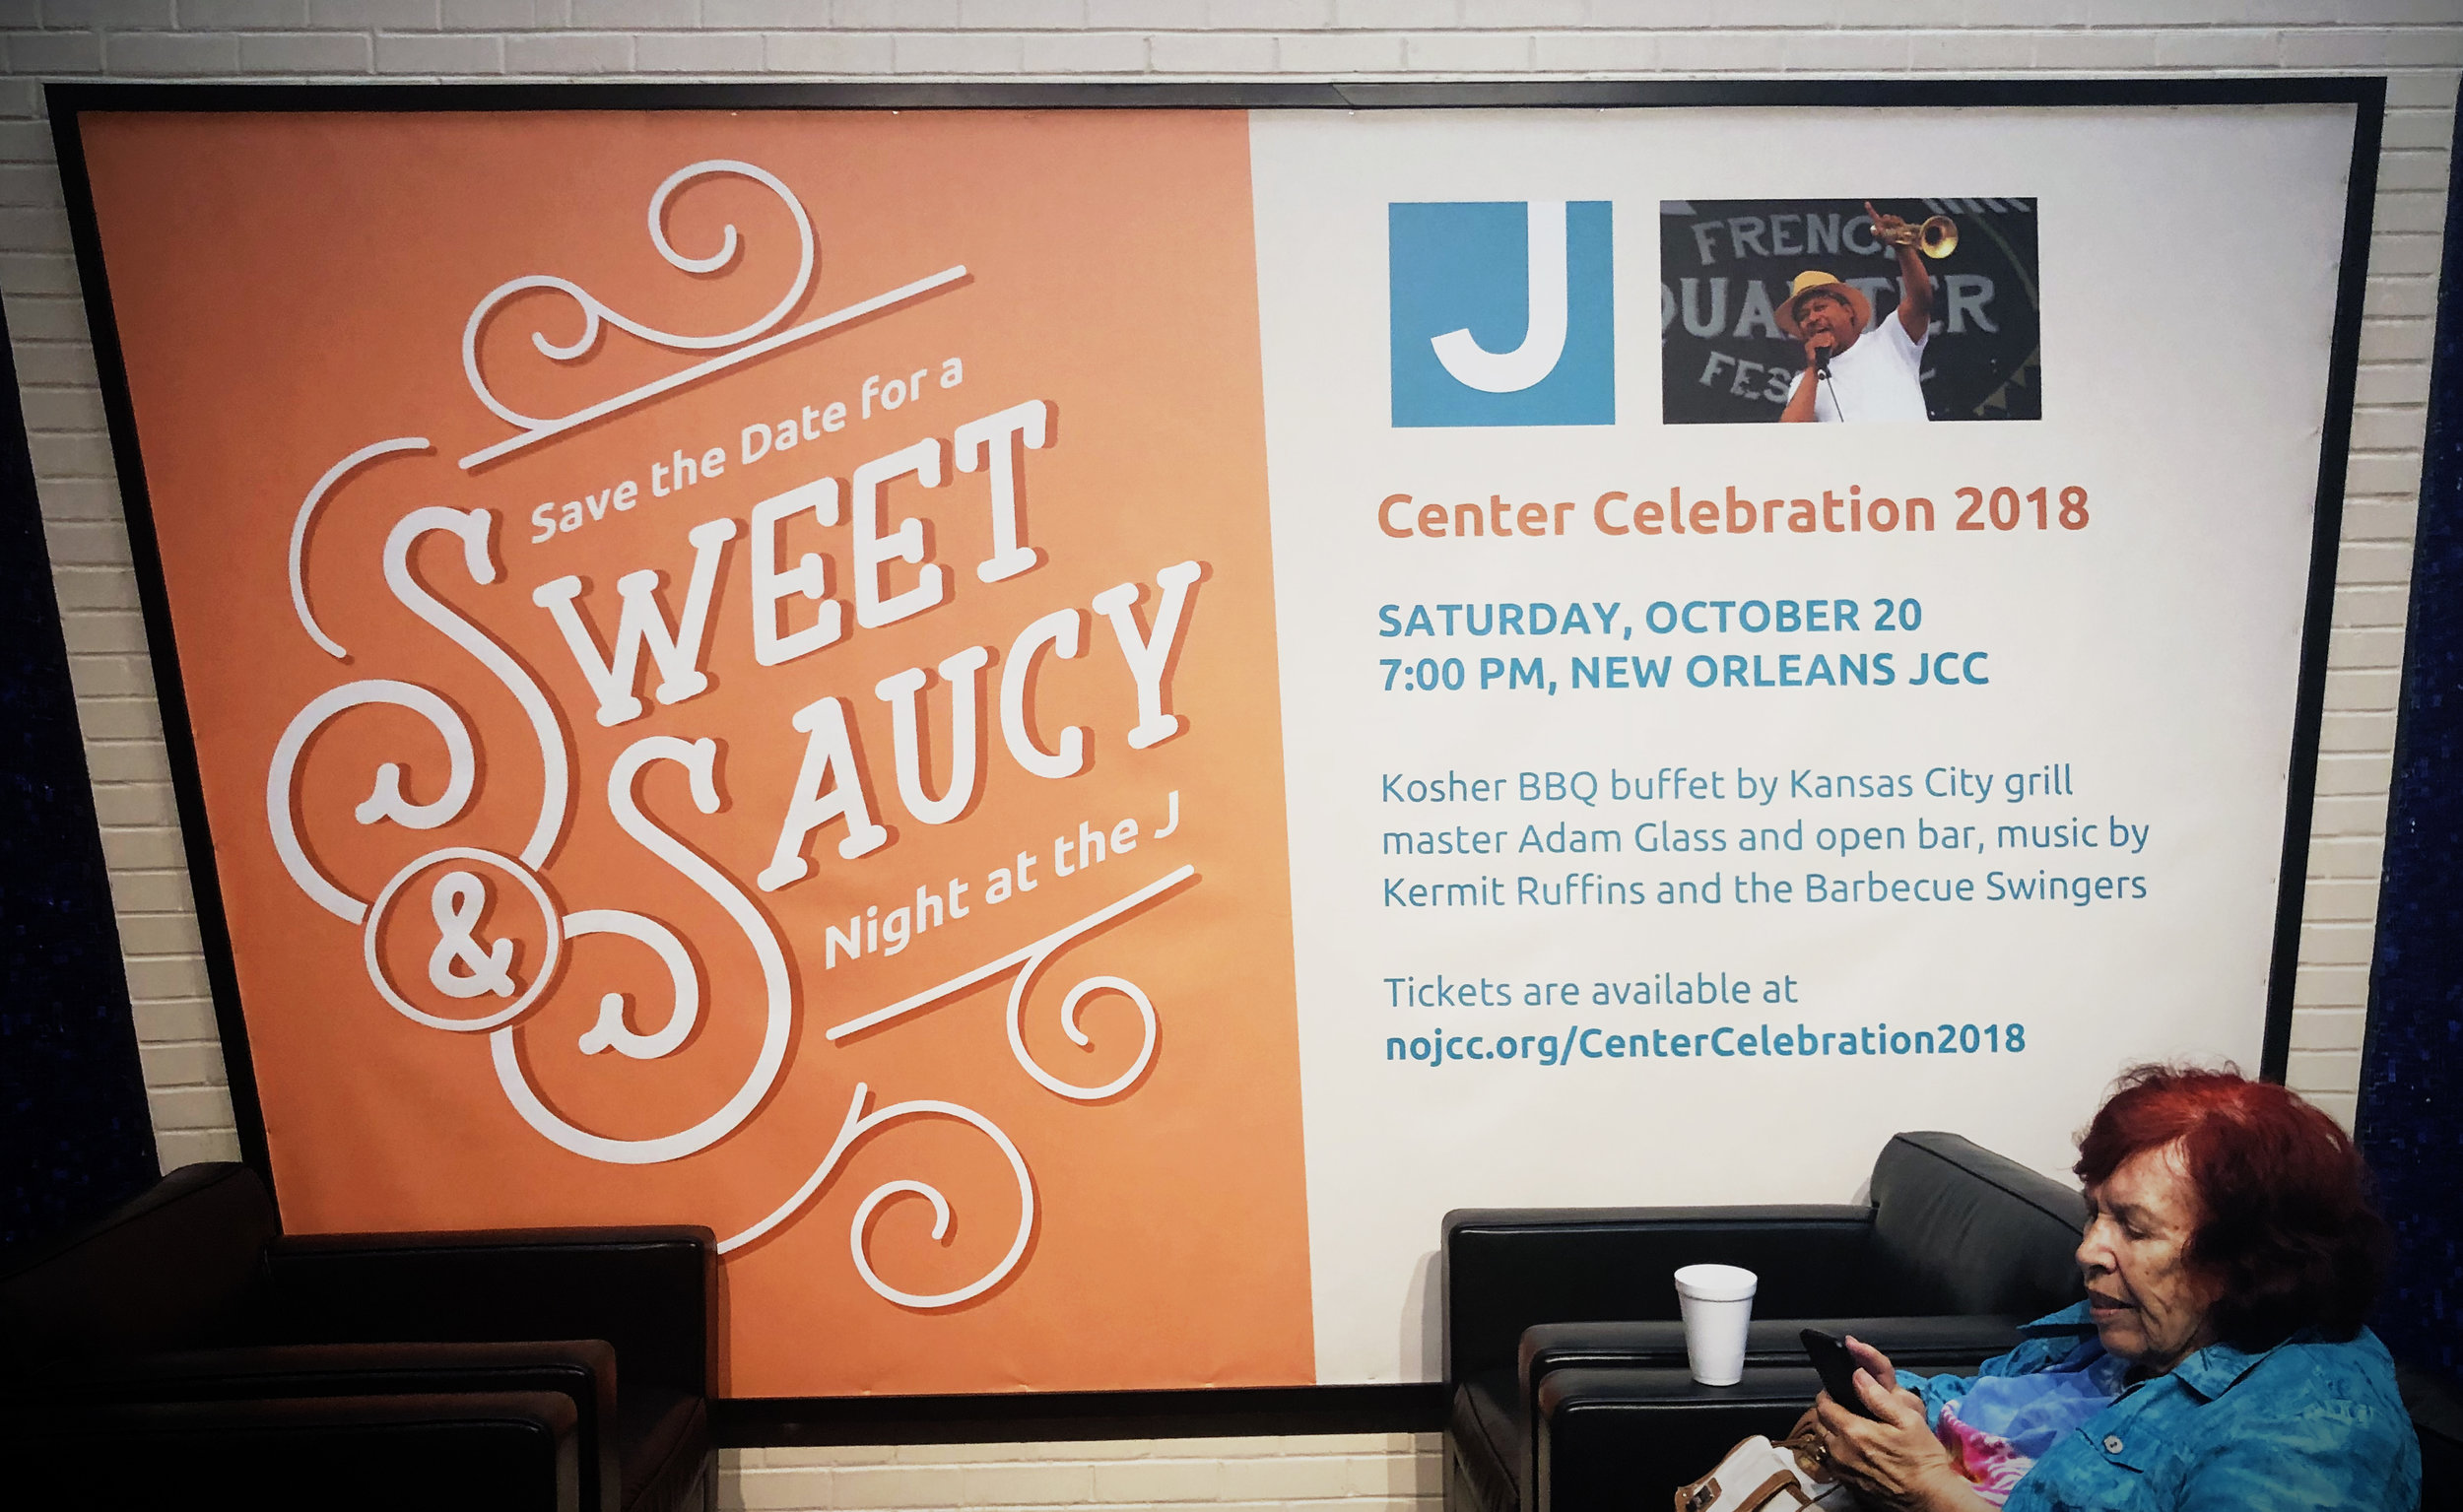 Indoor Banner for the 2018 New Orleans JCC Center Celebration.